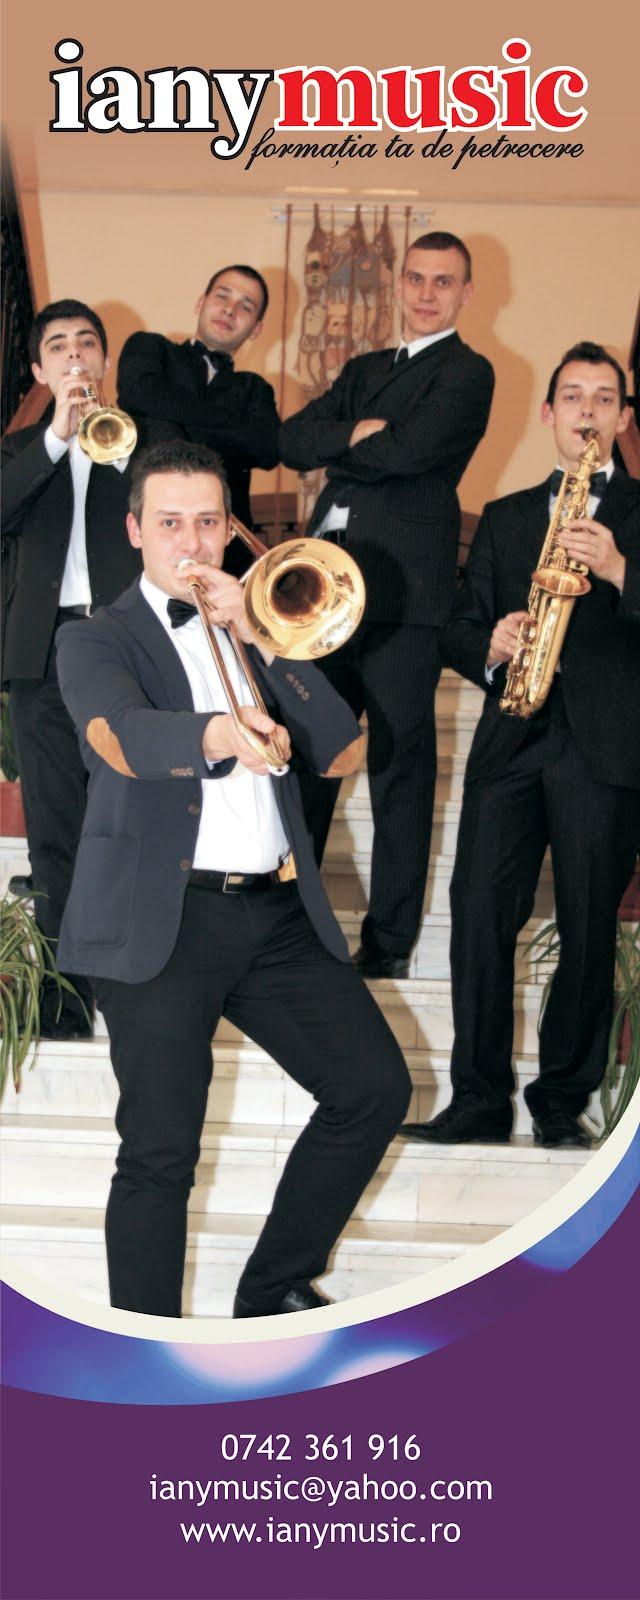 Formatia Iany Musicnuntapetrecerenunti De Basmiasisuceavabacau